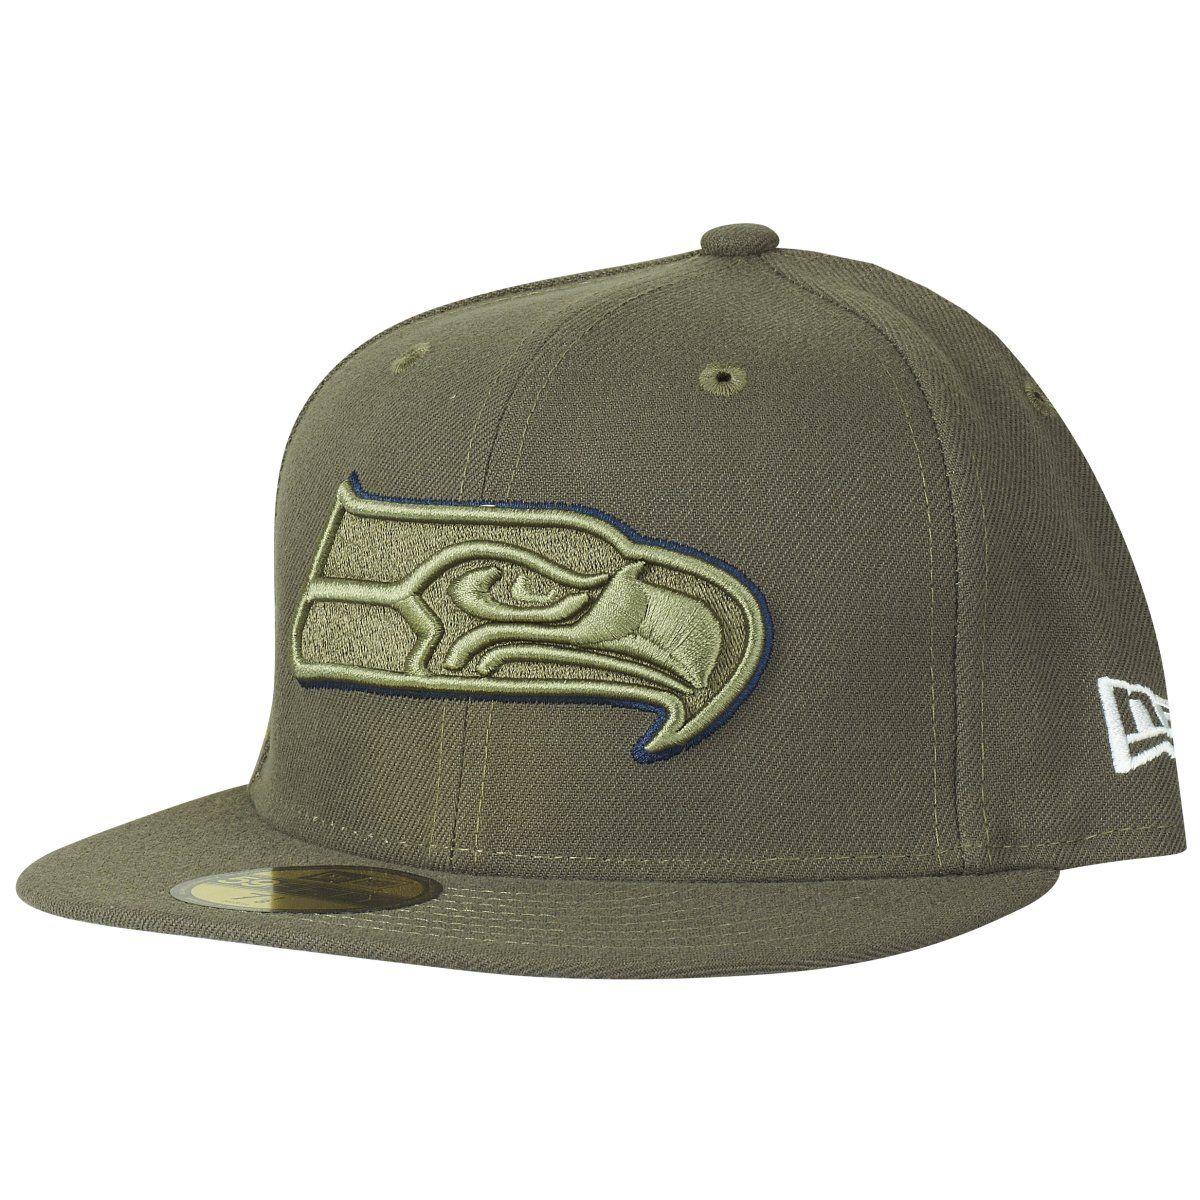 amfoo - New Era 59Fifty Cap - Salute to Service Seattle Seahawks